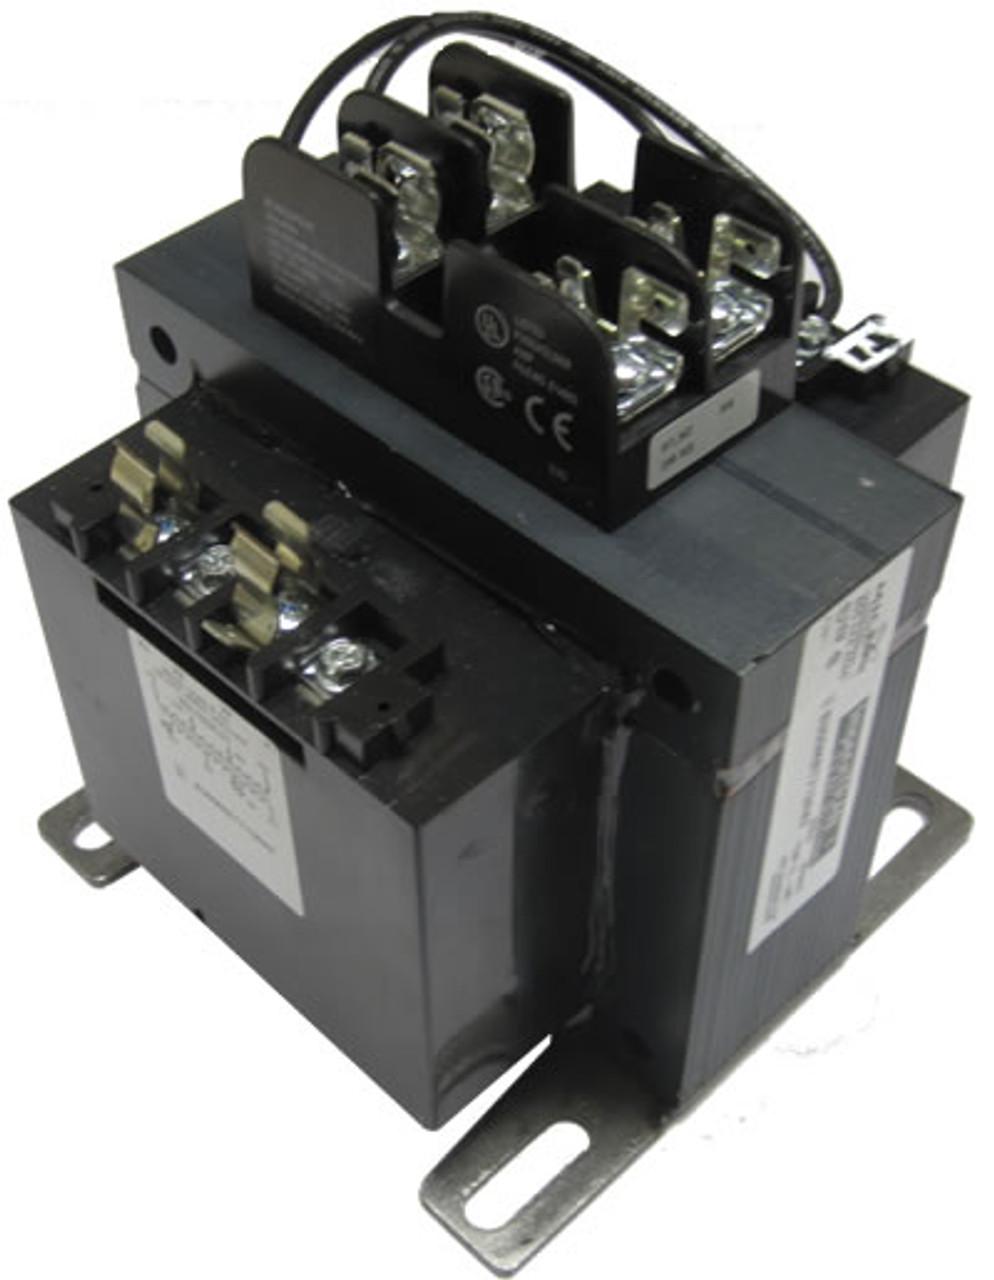 Micron Transformer Wiring Diagram from cdn11.bigcommerce.com